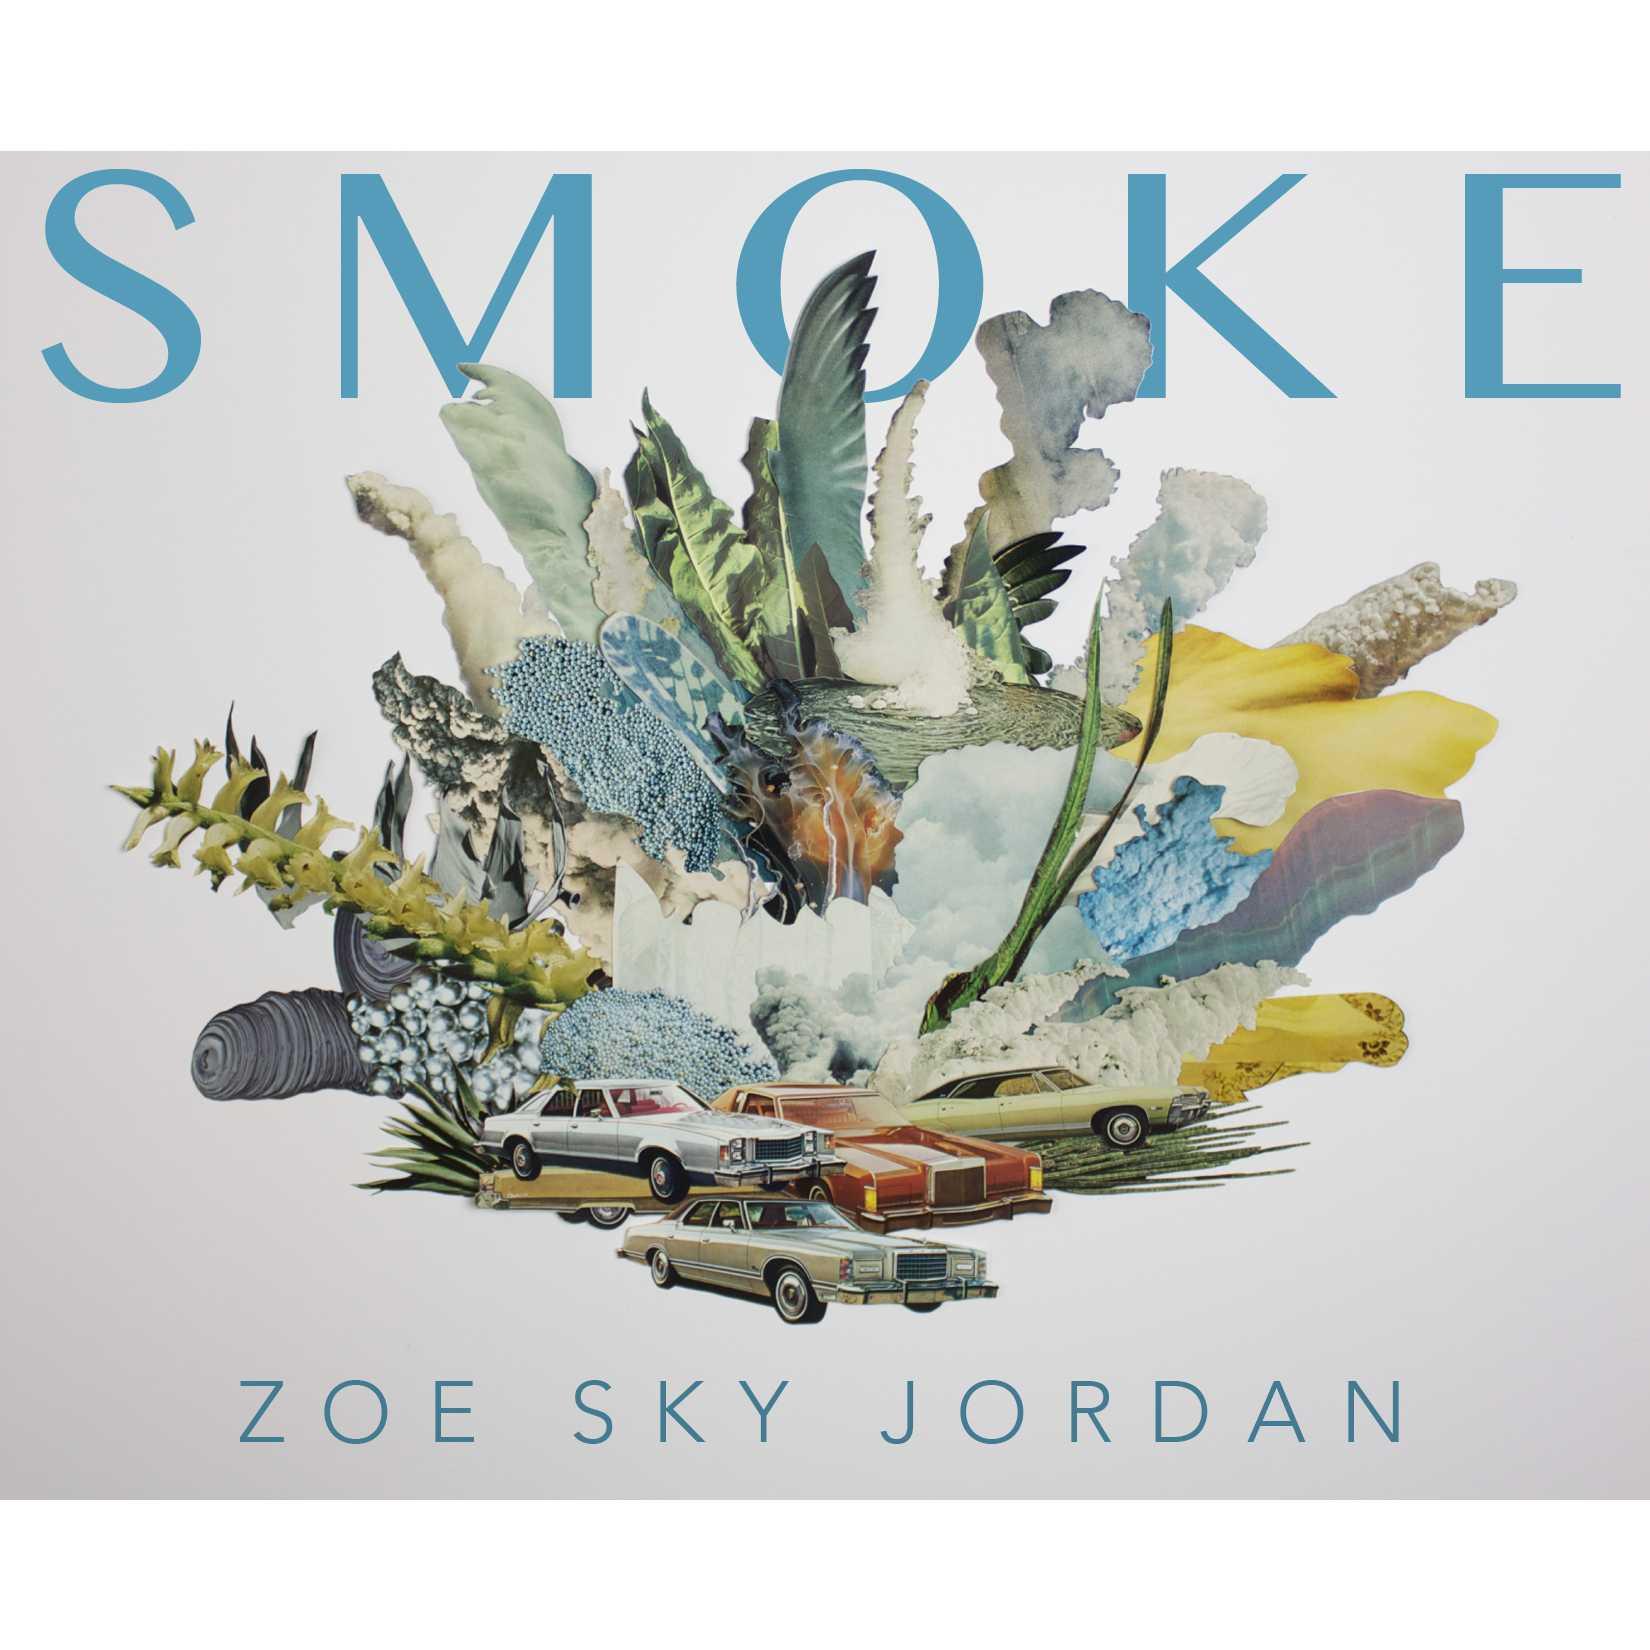 Zoe Sky Jordan Shares Her Latest Track